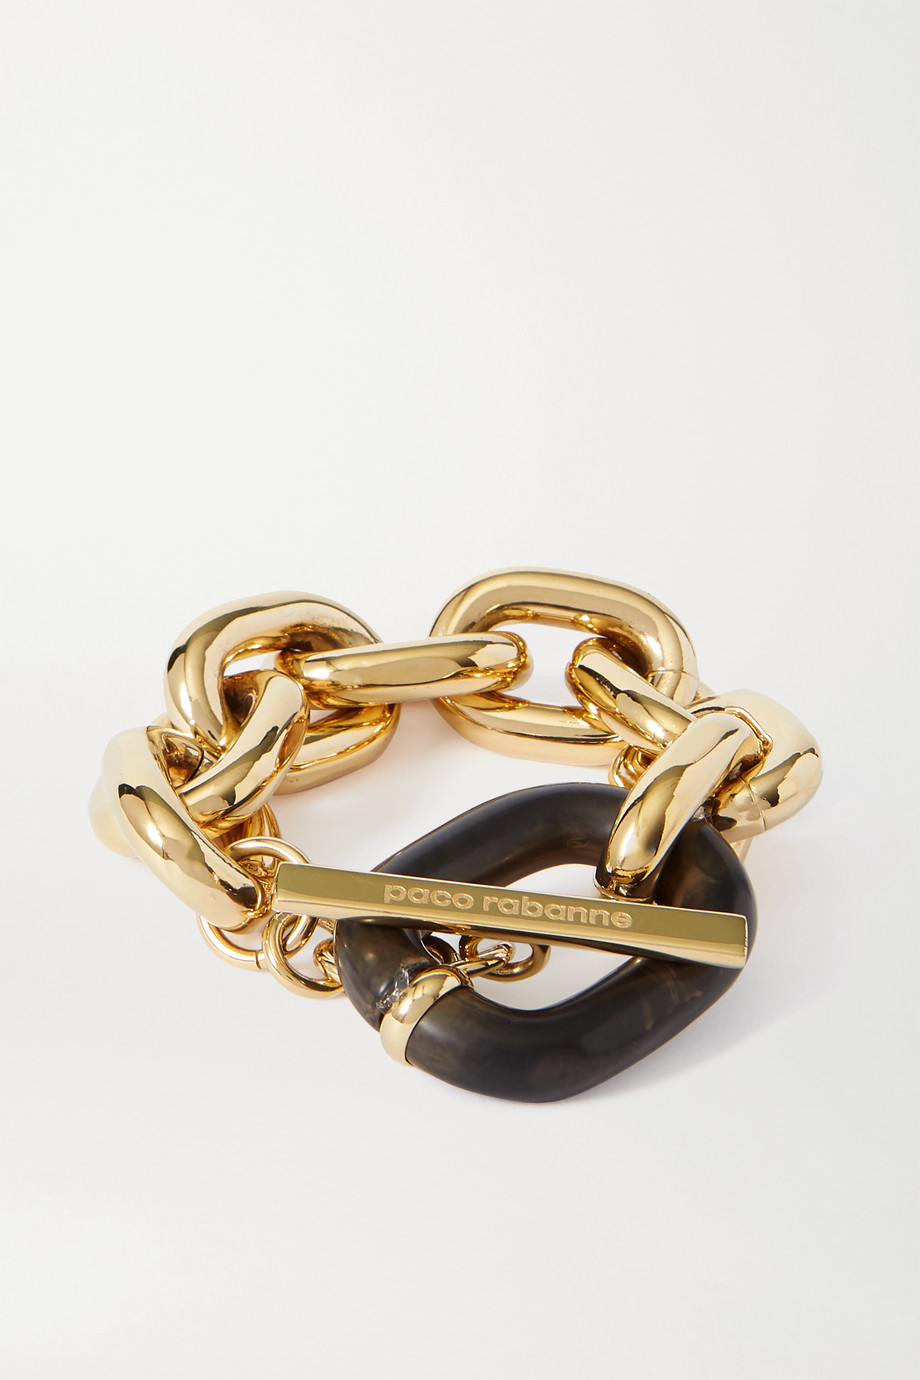 Paco Rabanne Goldfarbenes Armband mit Detail aus Acryl